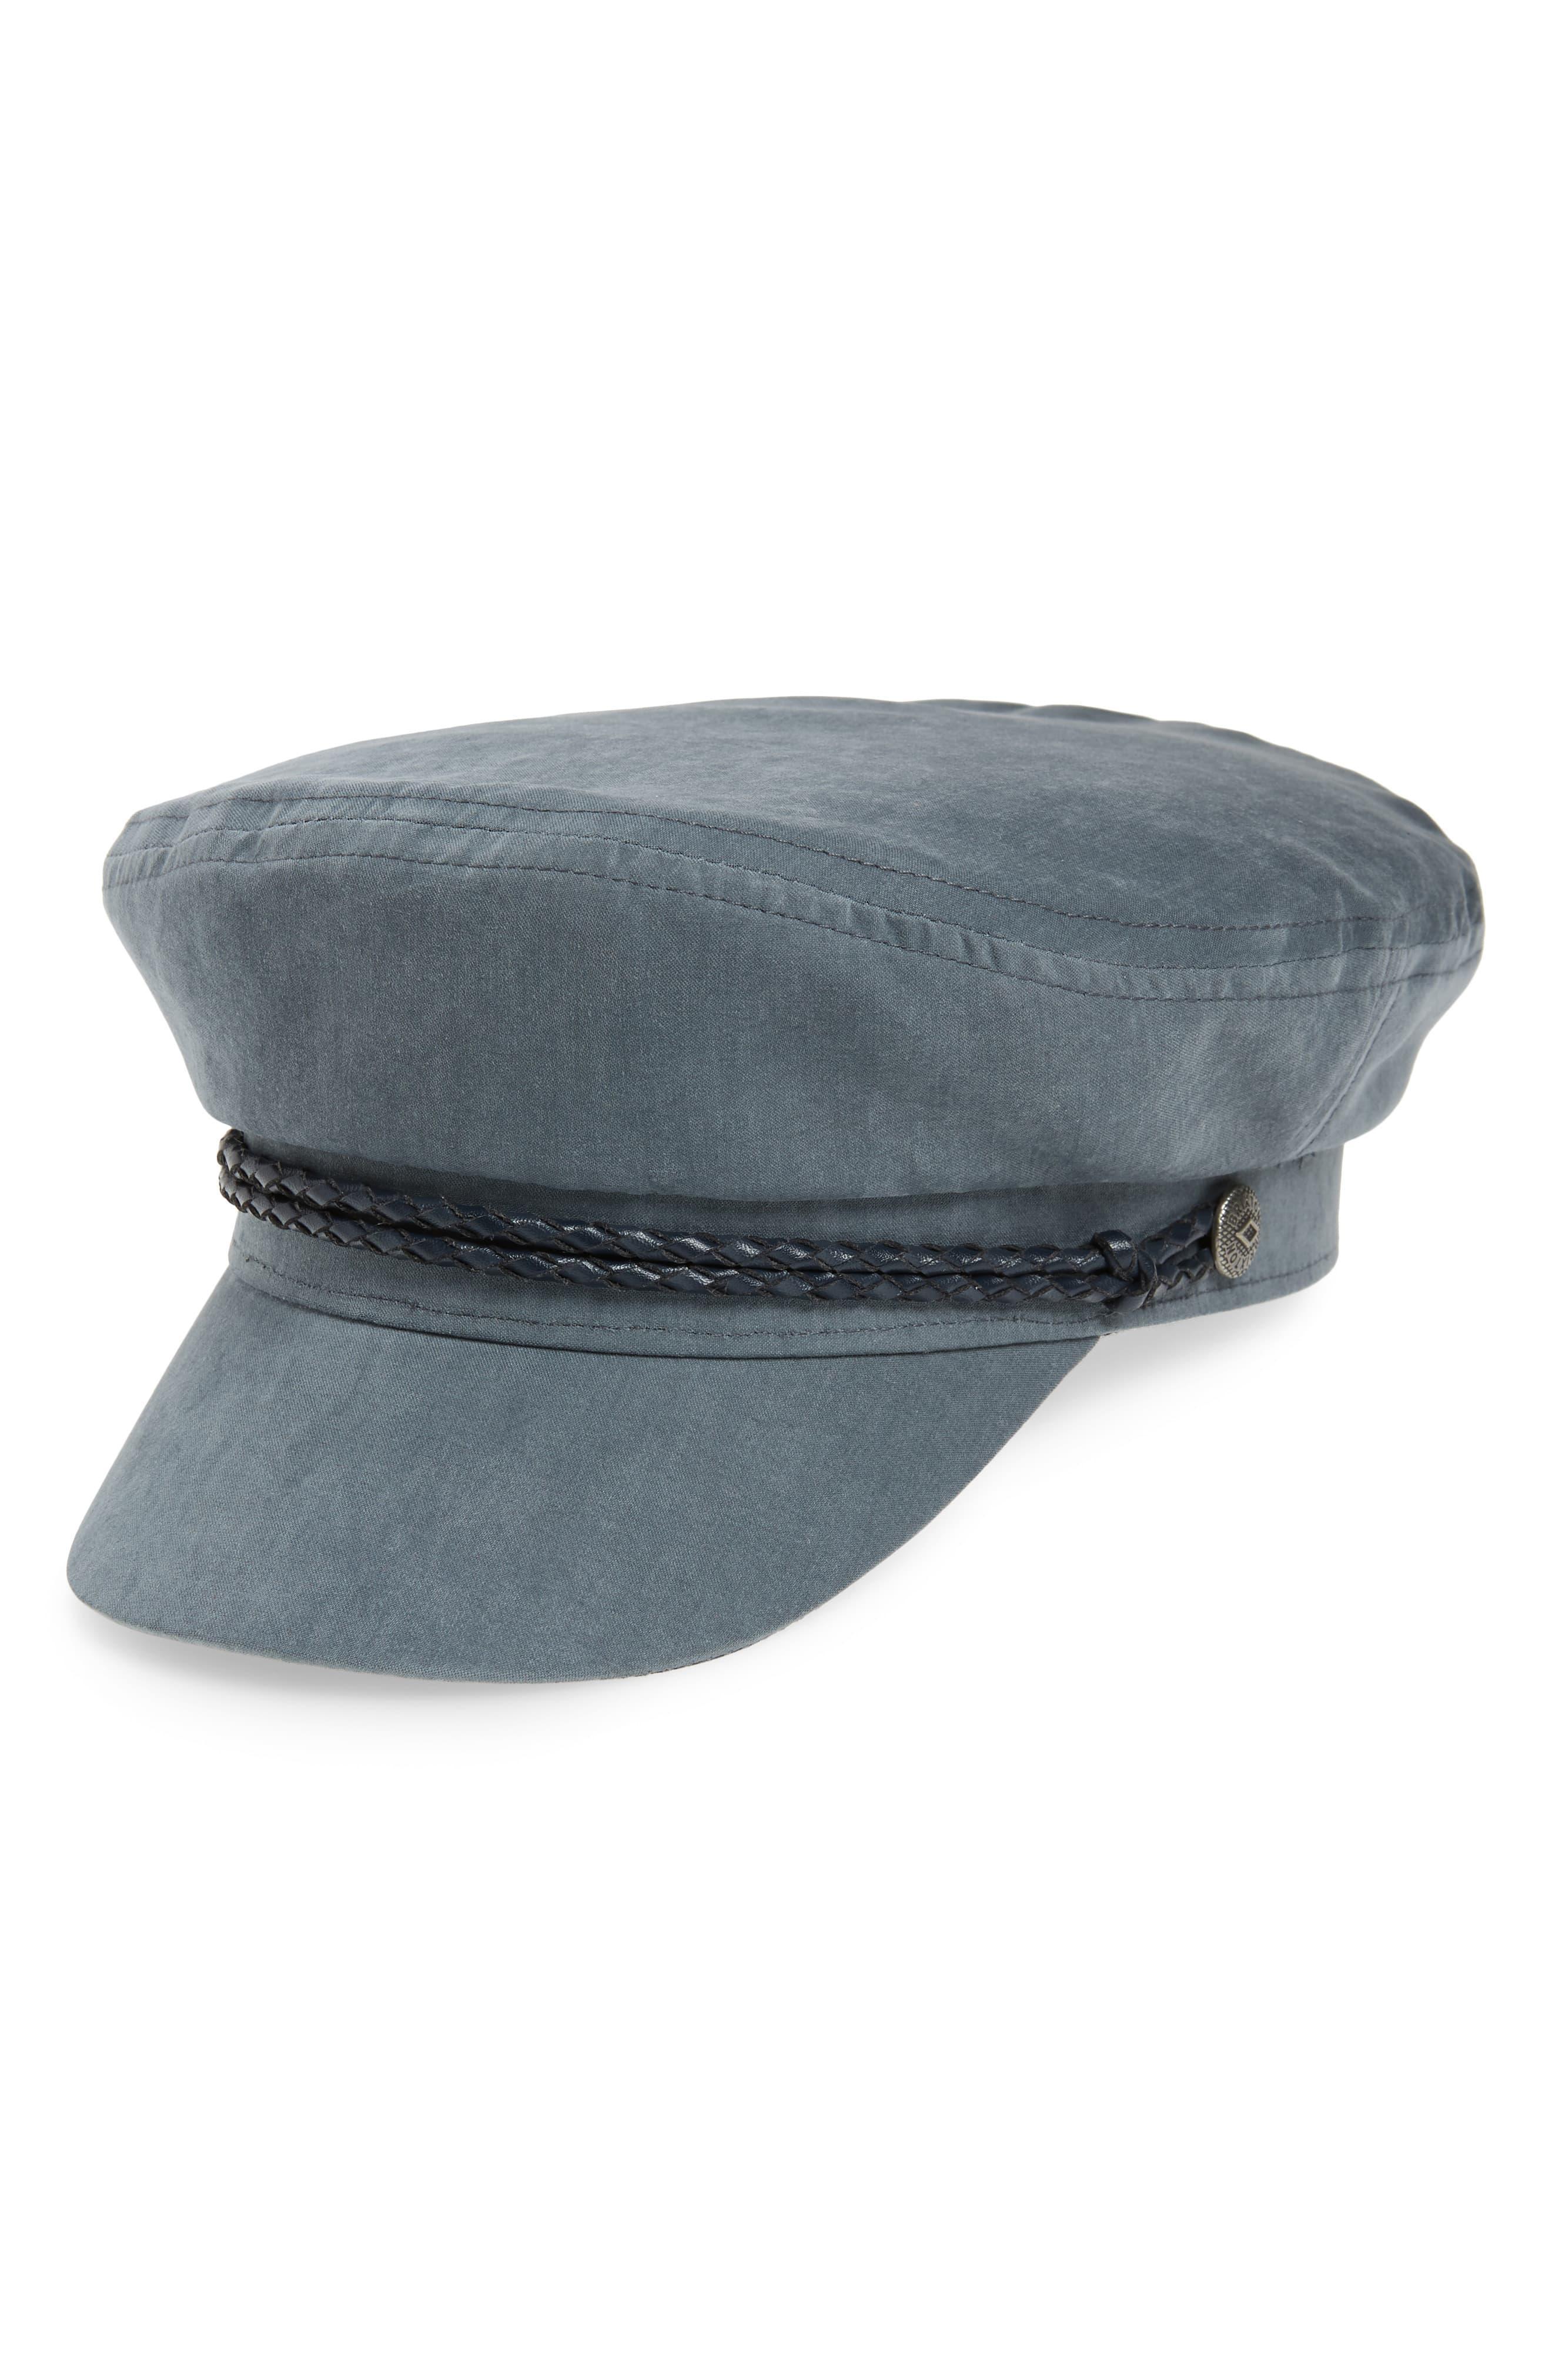 97c9edc4a Brixton Ashland Baker Boy Cap in Blue - Lyst